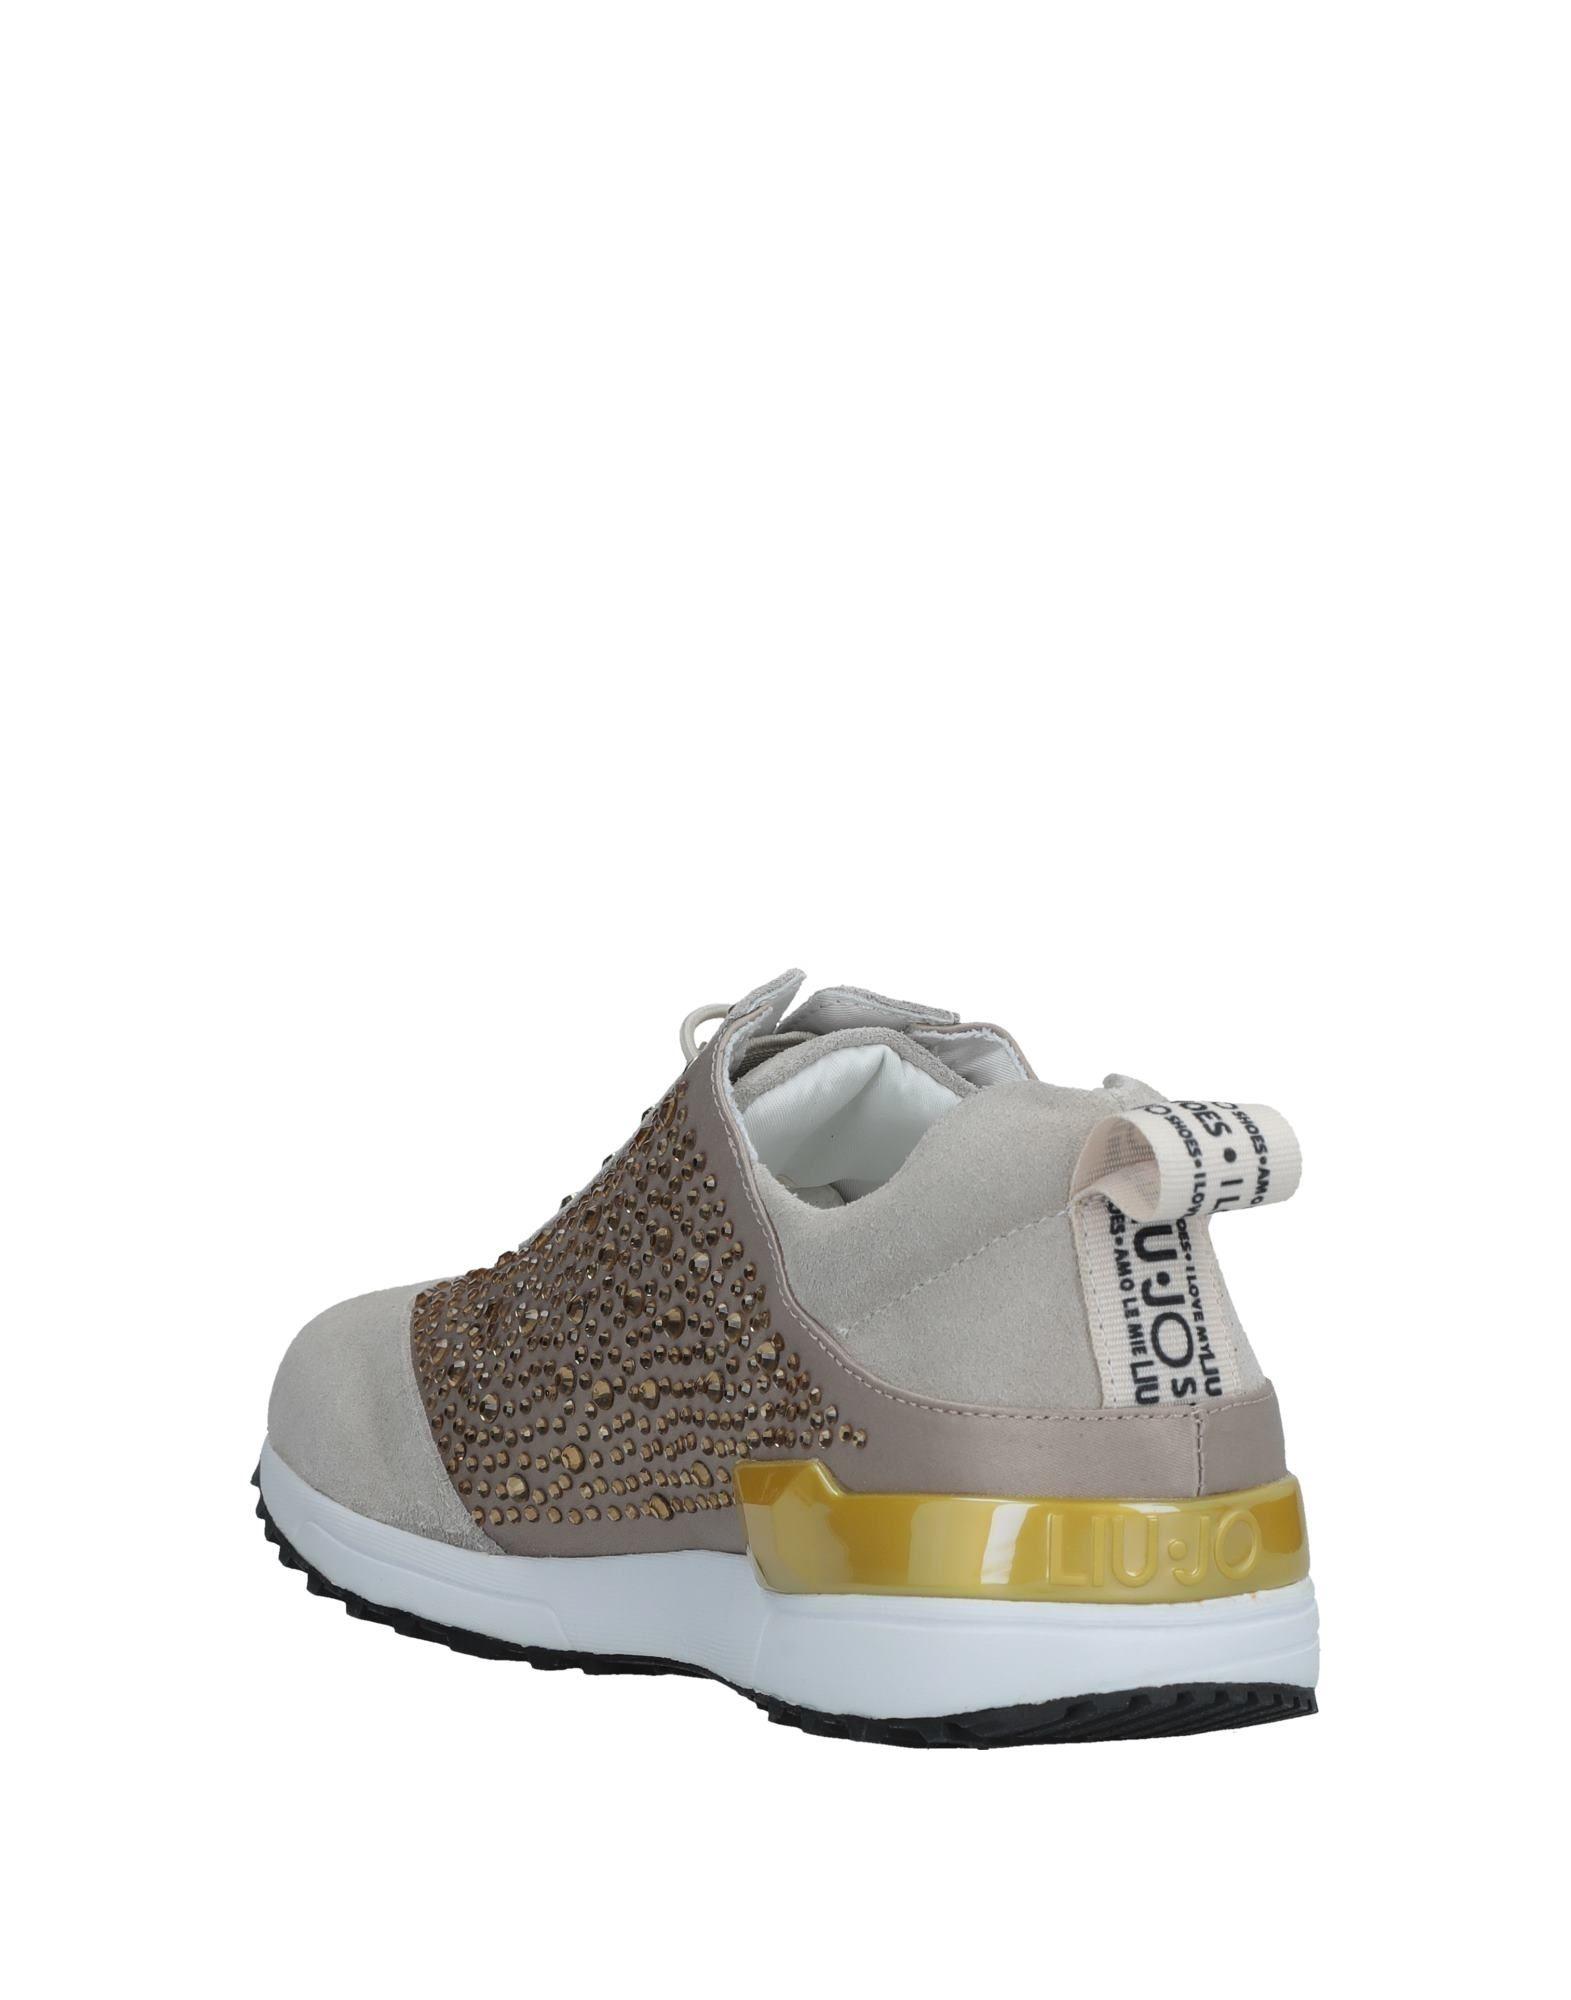 Liu •Jo Shoes Gute Sneakers Damen  11359899MC Gute Shoes Qualität beliebte Schuhe 9976a2